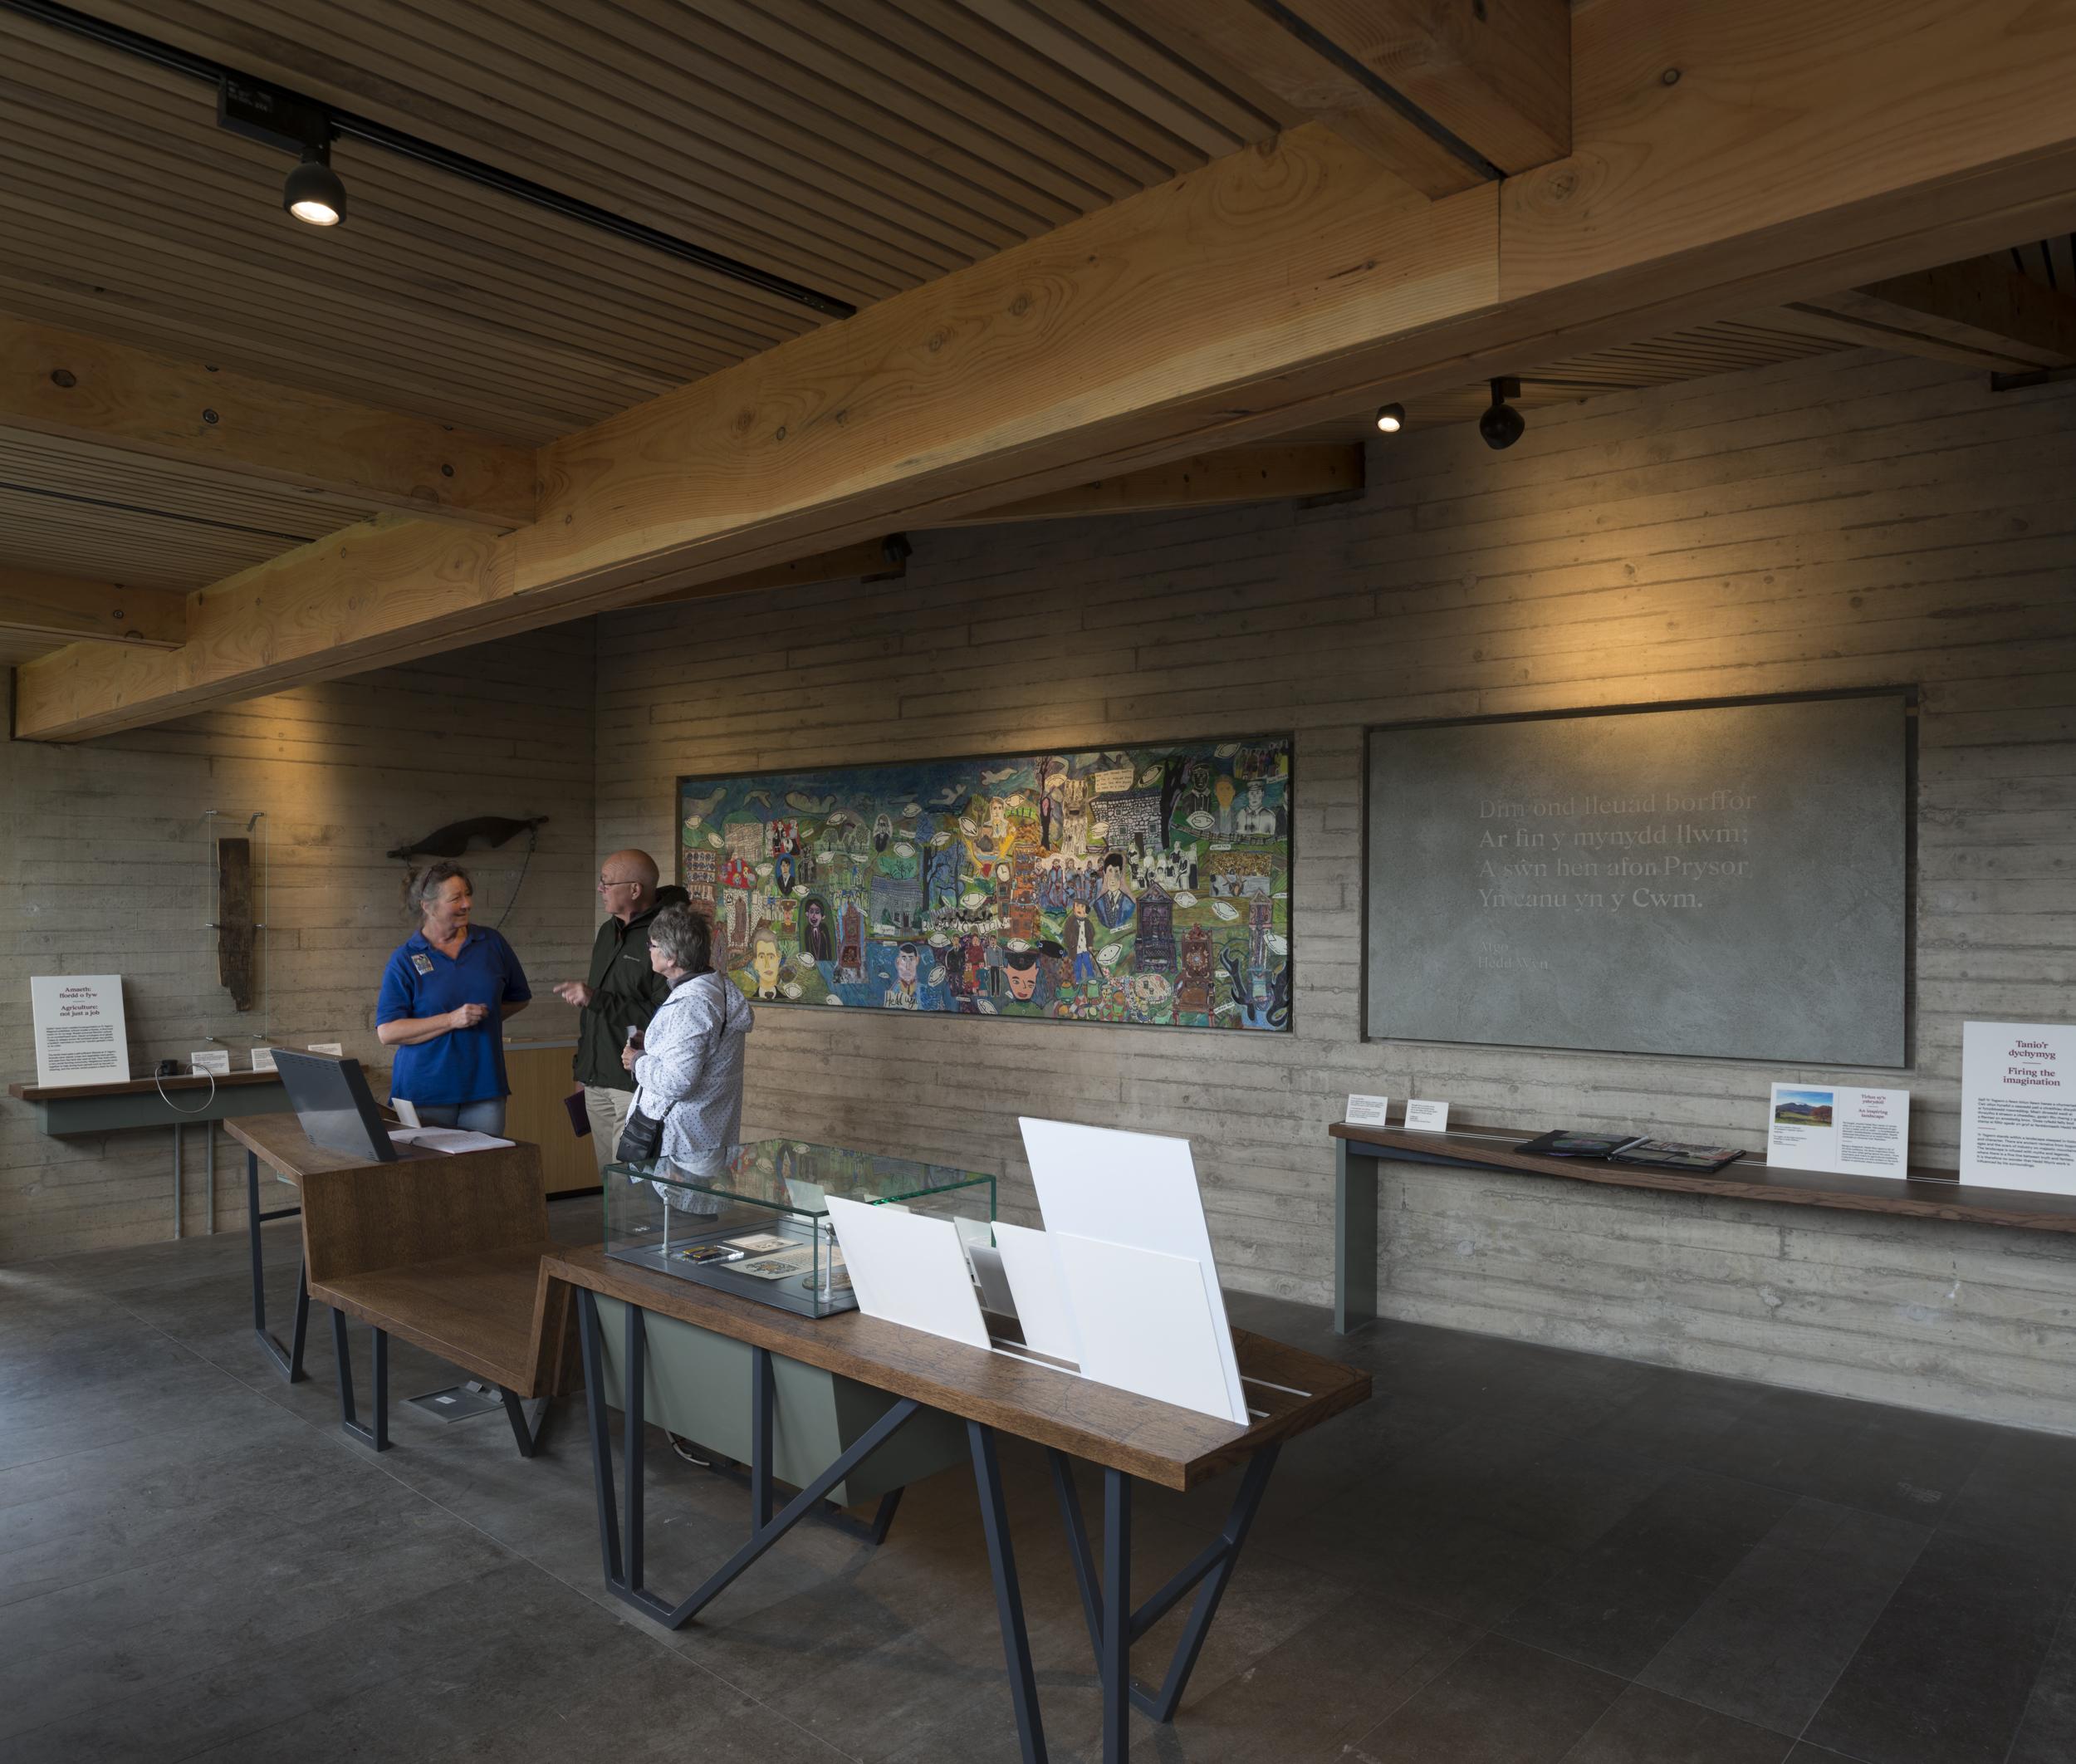 Beudy Llwyd-Visitor Centre